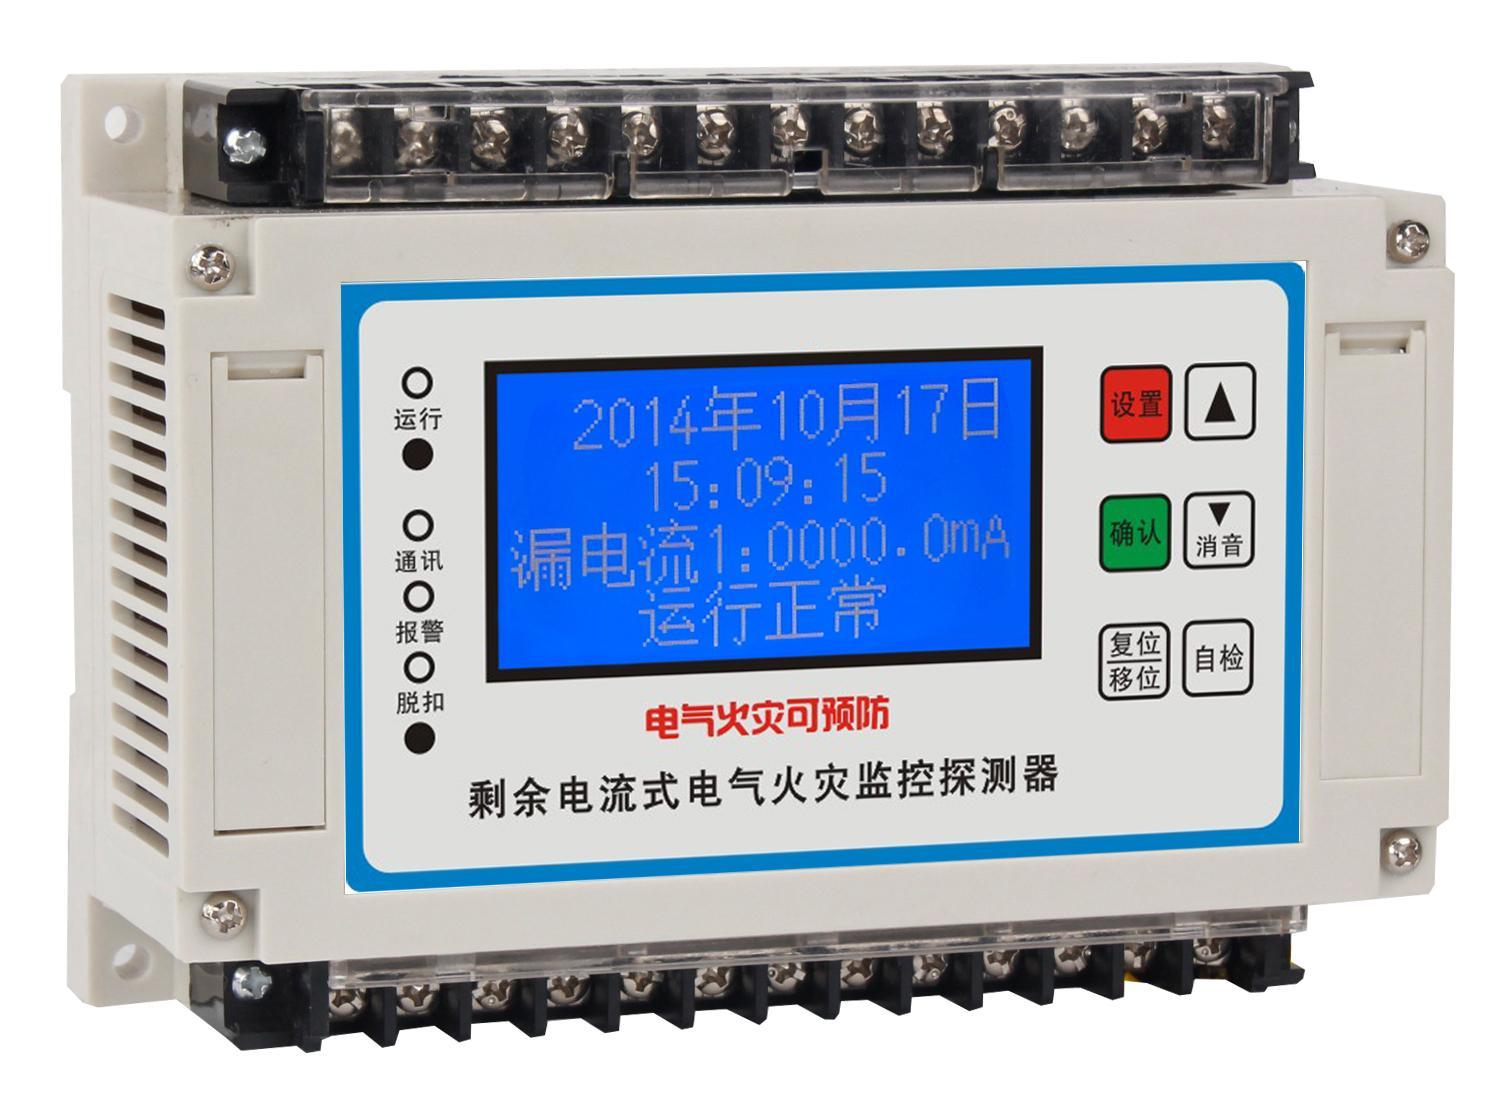 HSAD-R1 西安电气火灾监控供应商